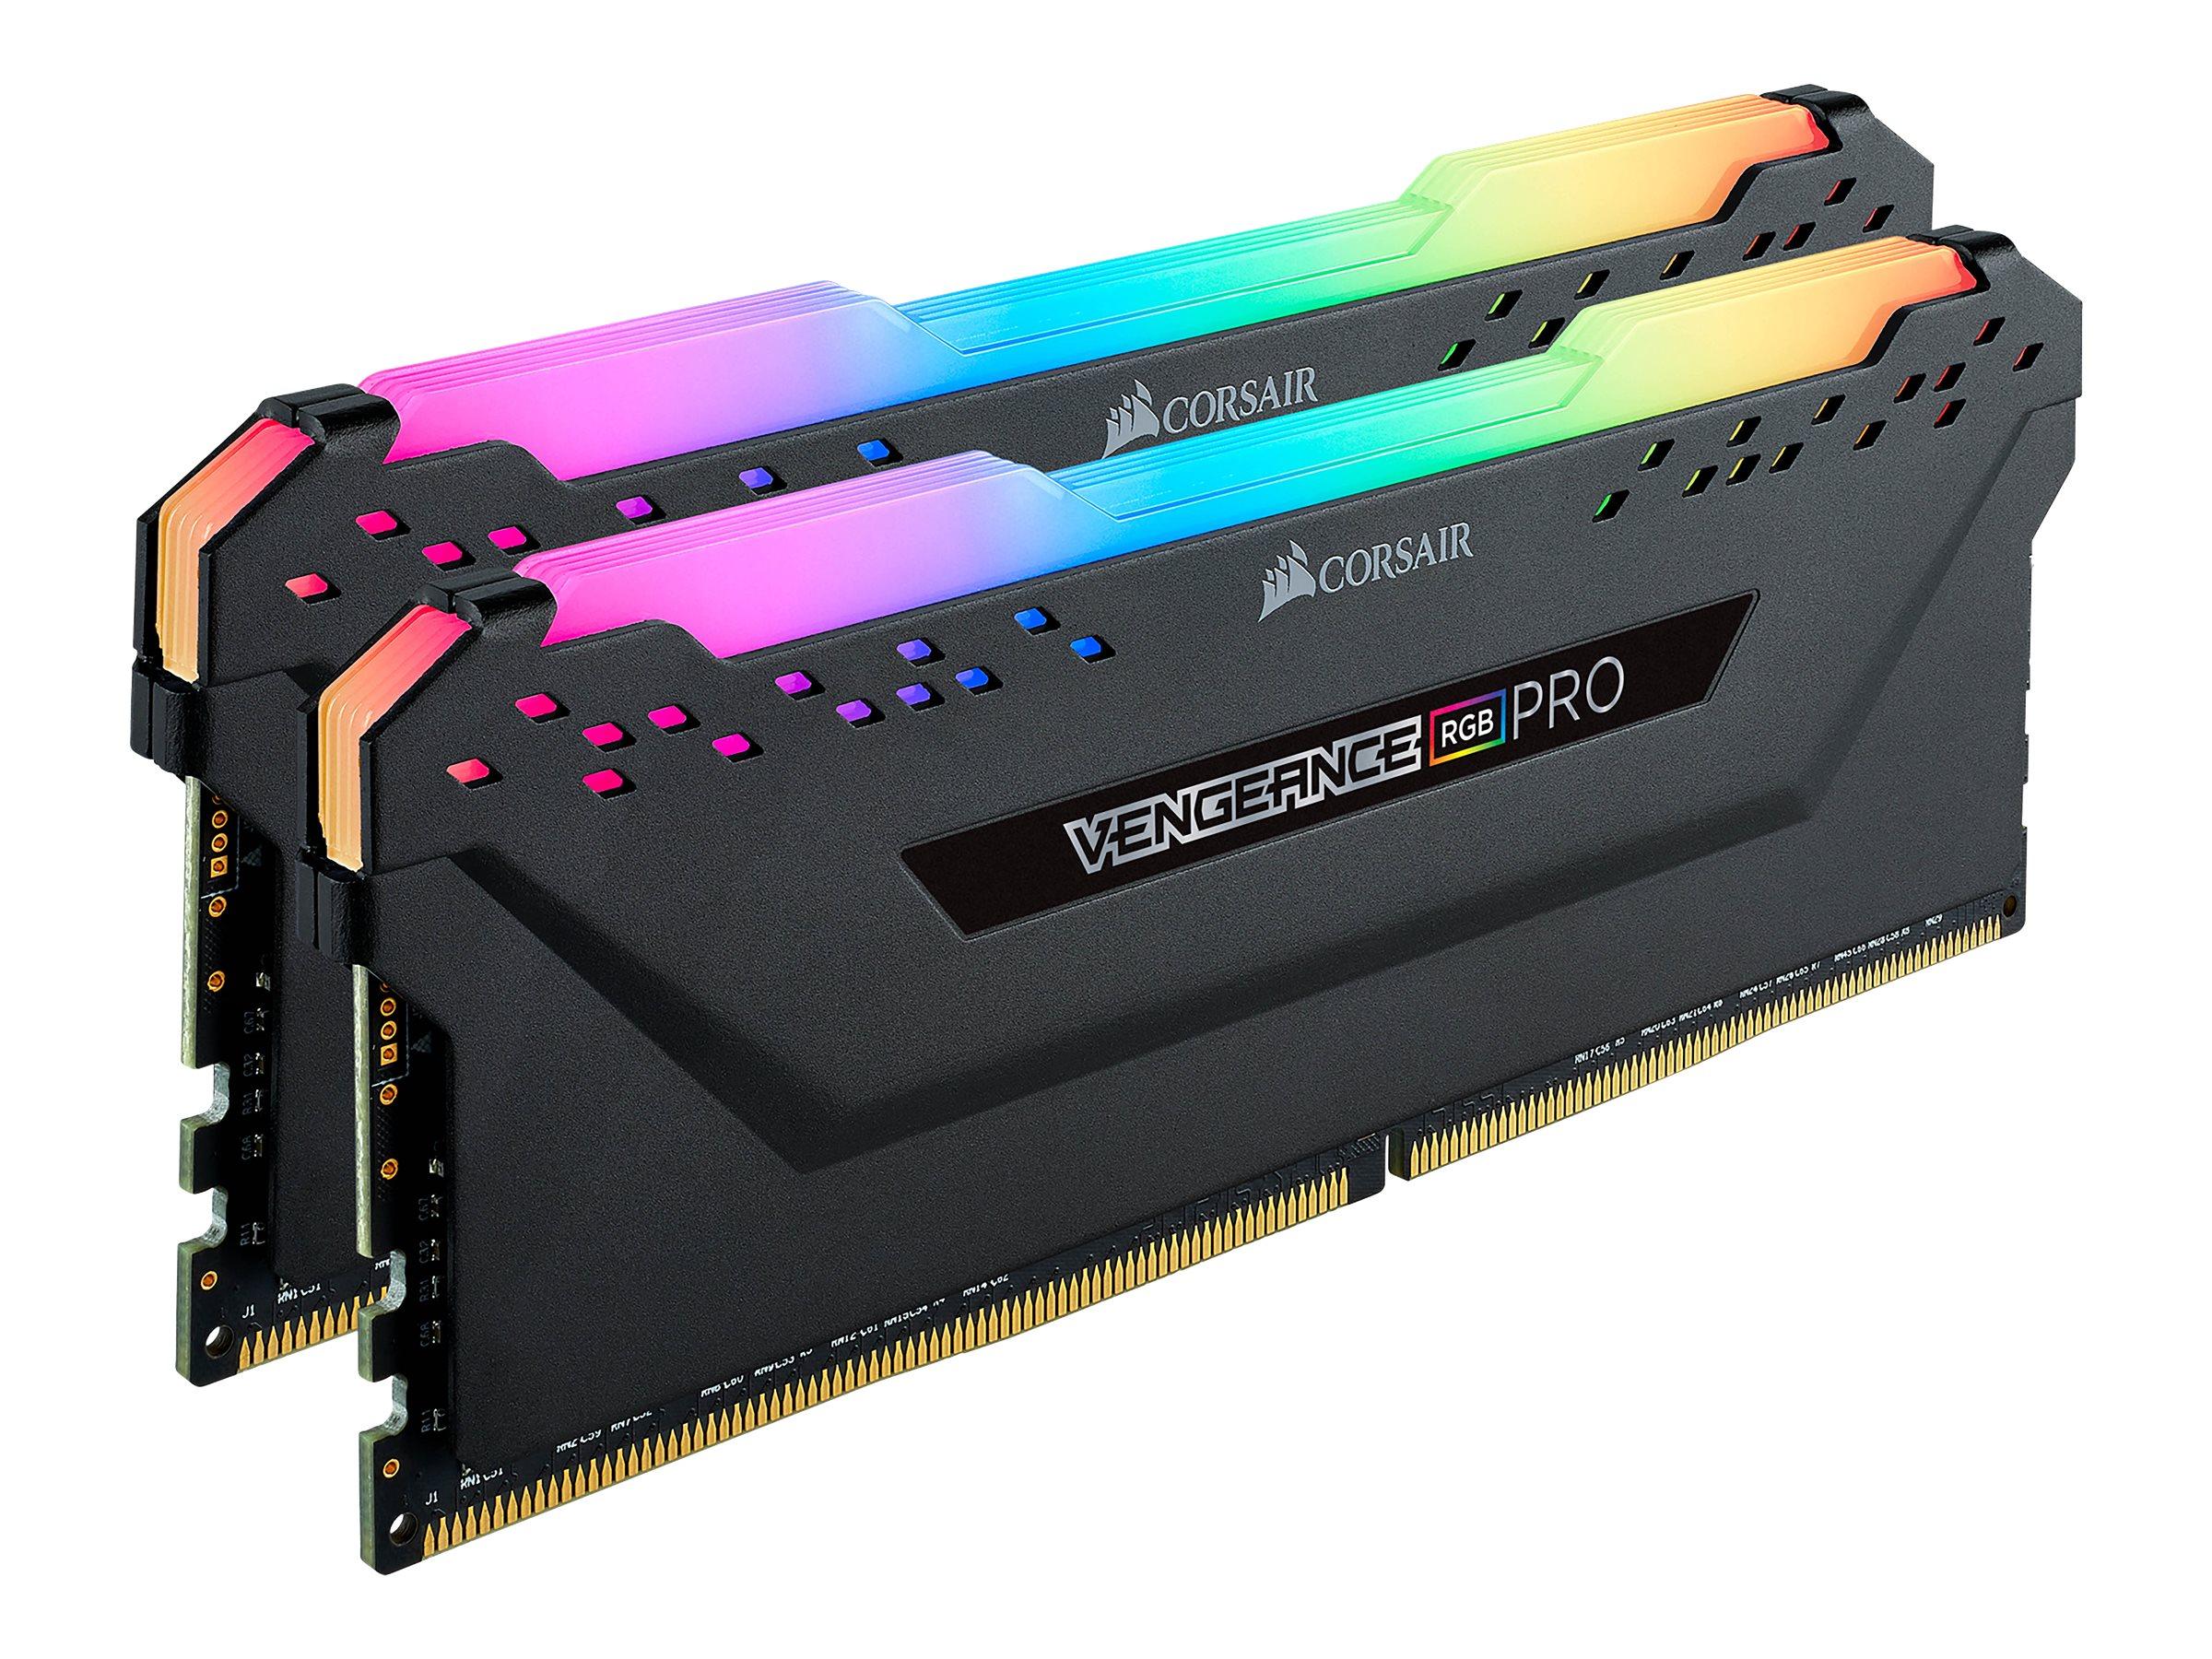 Vorschau: Corsair Vengeance RGB PRO - DDR4 - 64 GB: 2 x 32 GB